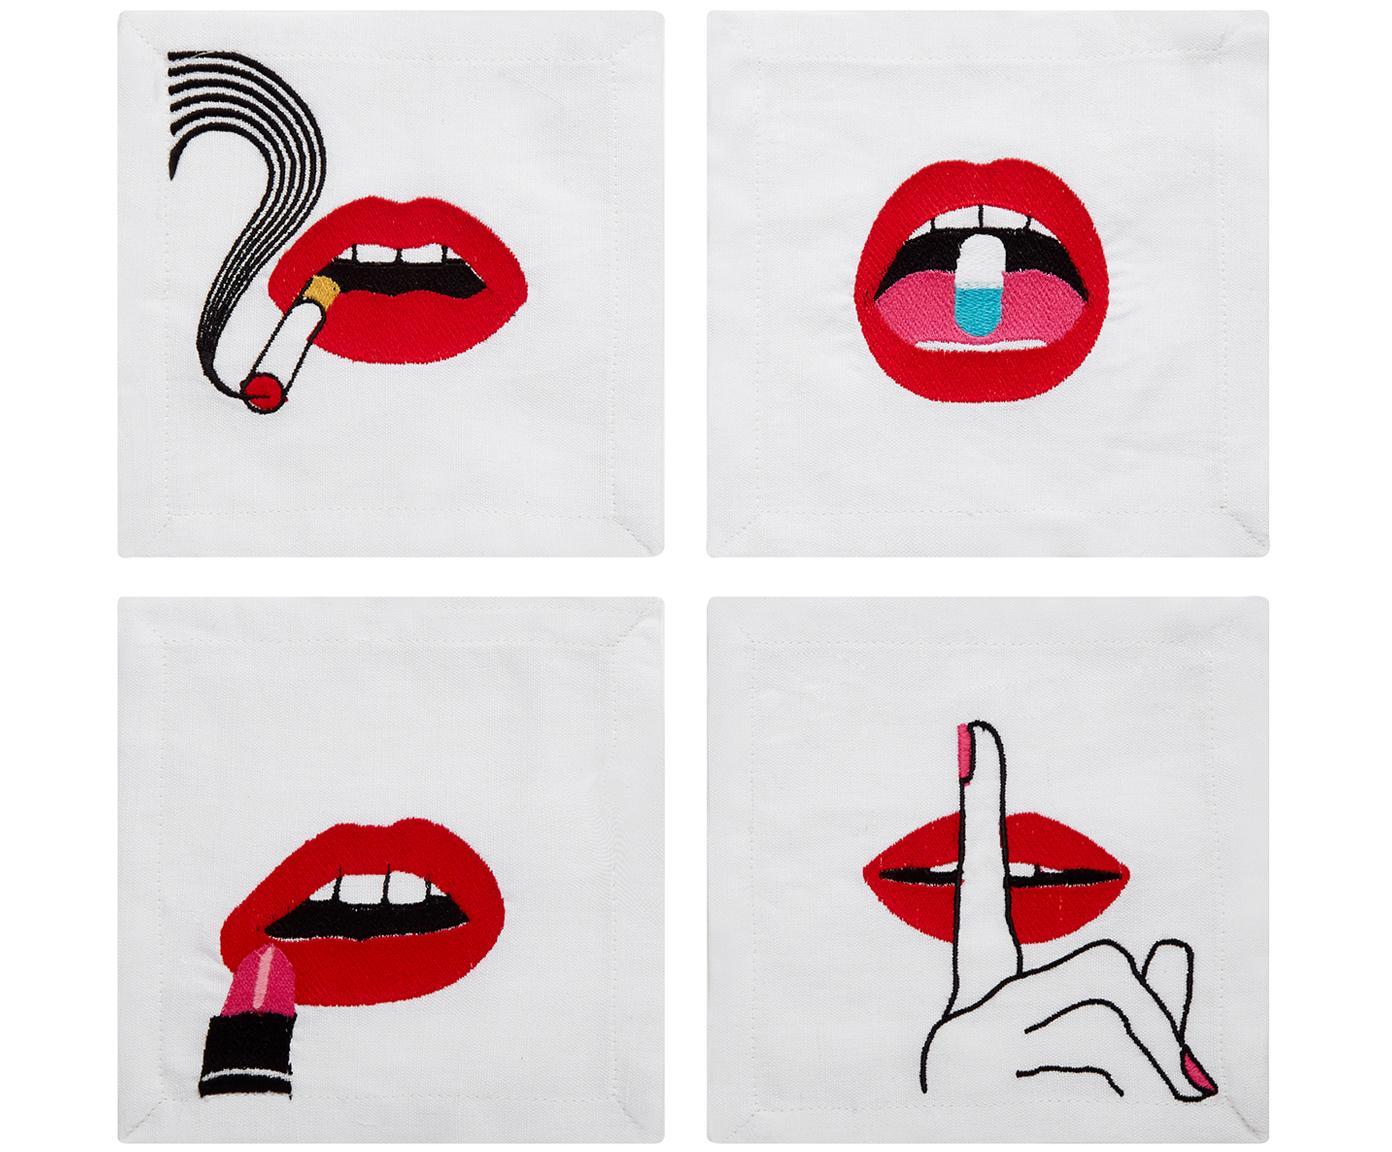 Set de servilletas cóctel en lino de diseño Muzzy, 4 pzas., Lino, Blanco, rojo, negro, L 15 x An 15 cm